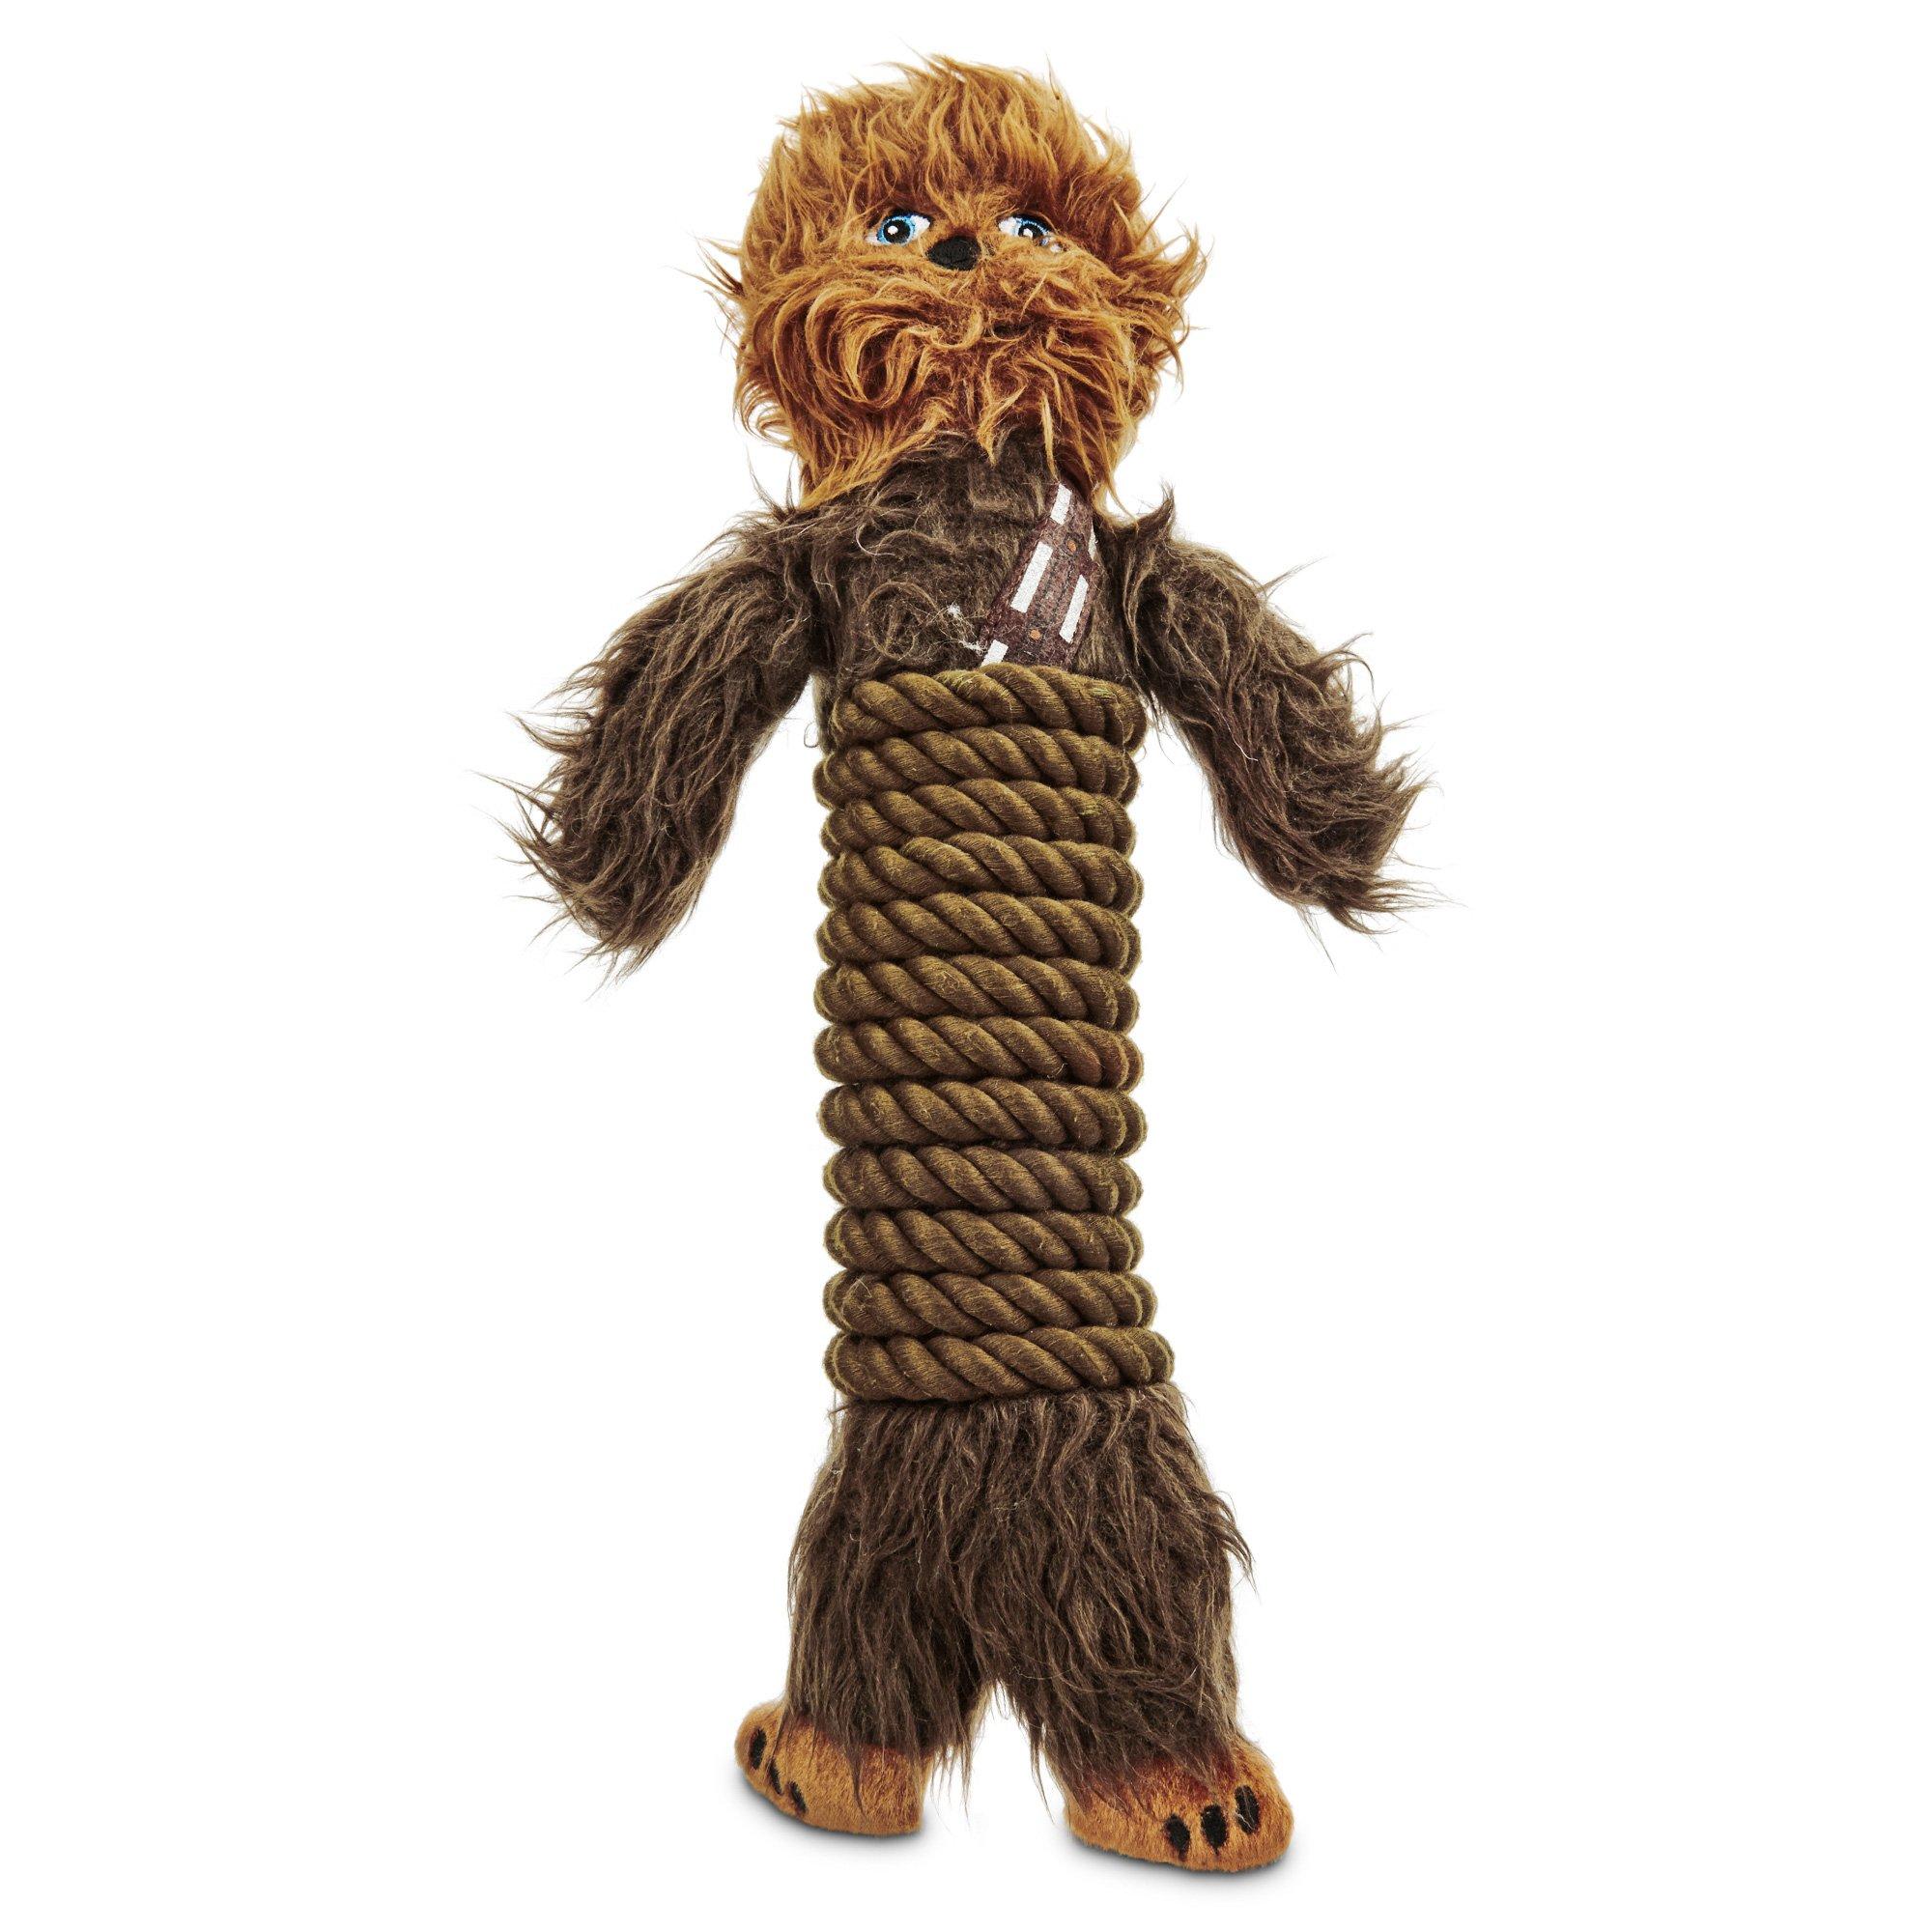 STAR WARS Chewbacca Rope Wrap Dog Toy